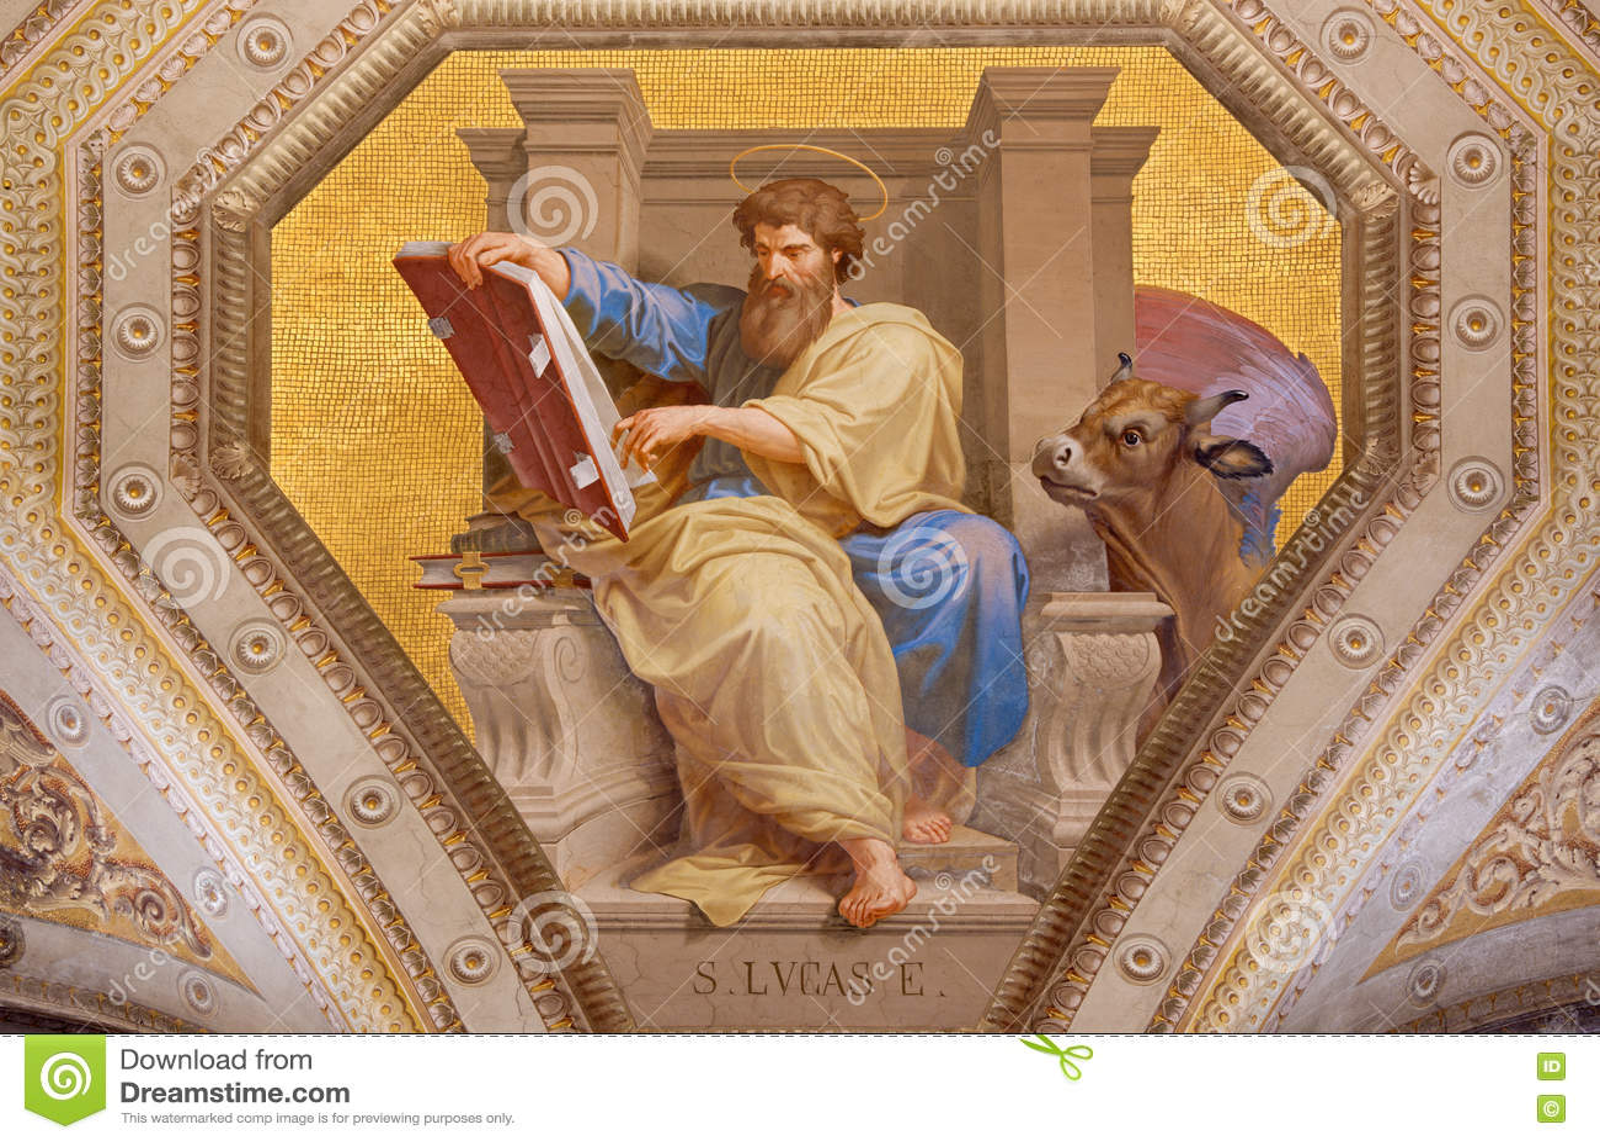 ROME, ITALY: Fresco of St. Luke the Evangelist in church Chiesa di Santa Maria in Aquiro by in neo-mannerist style.